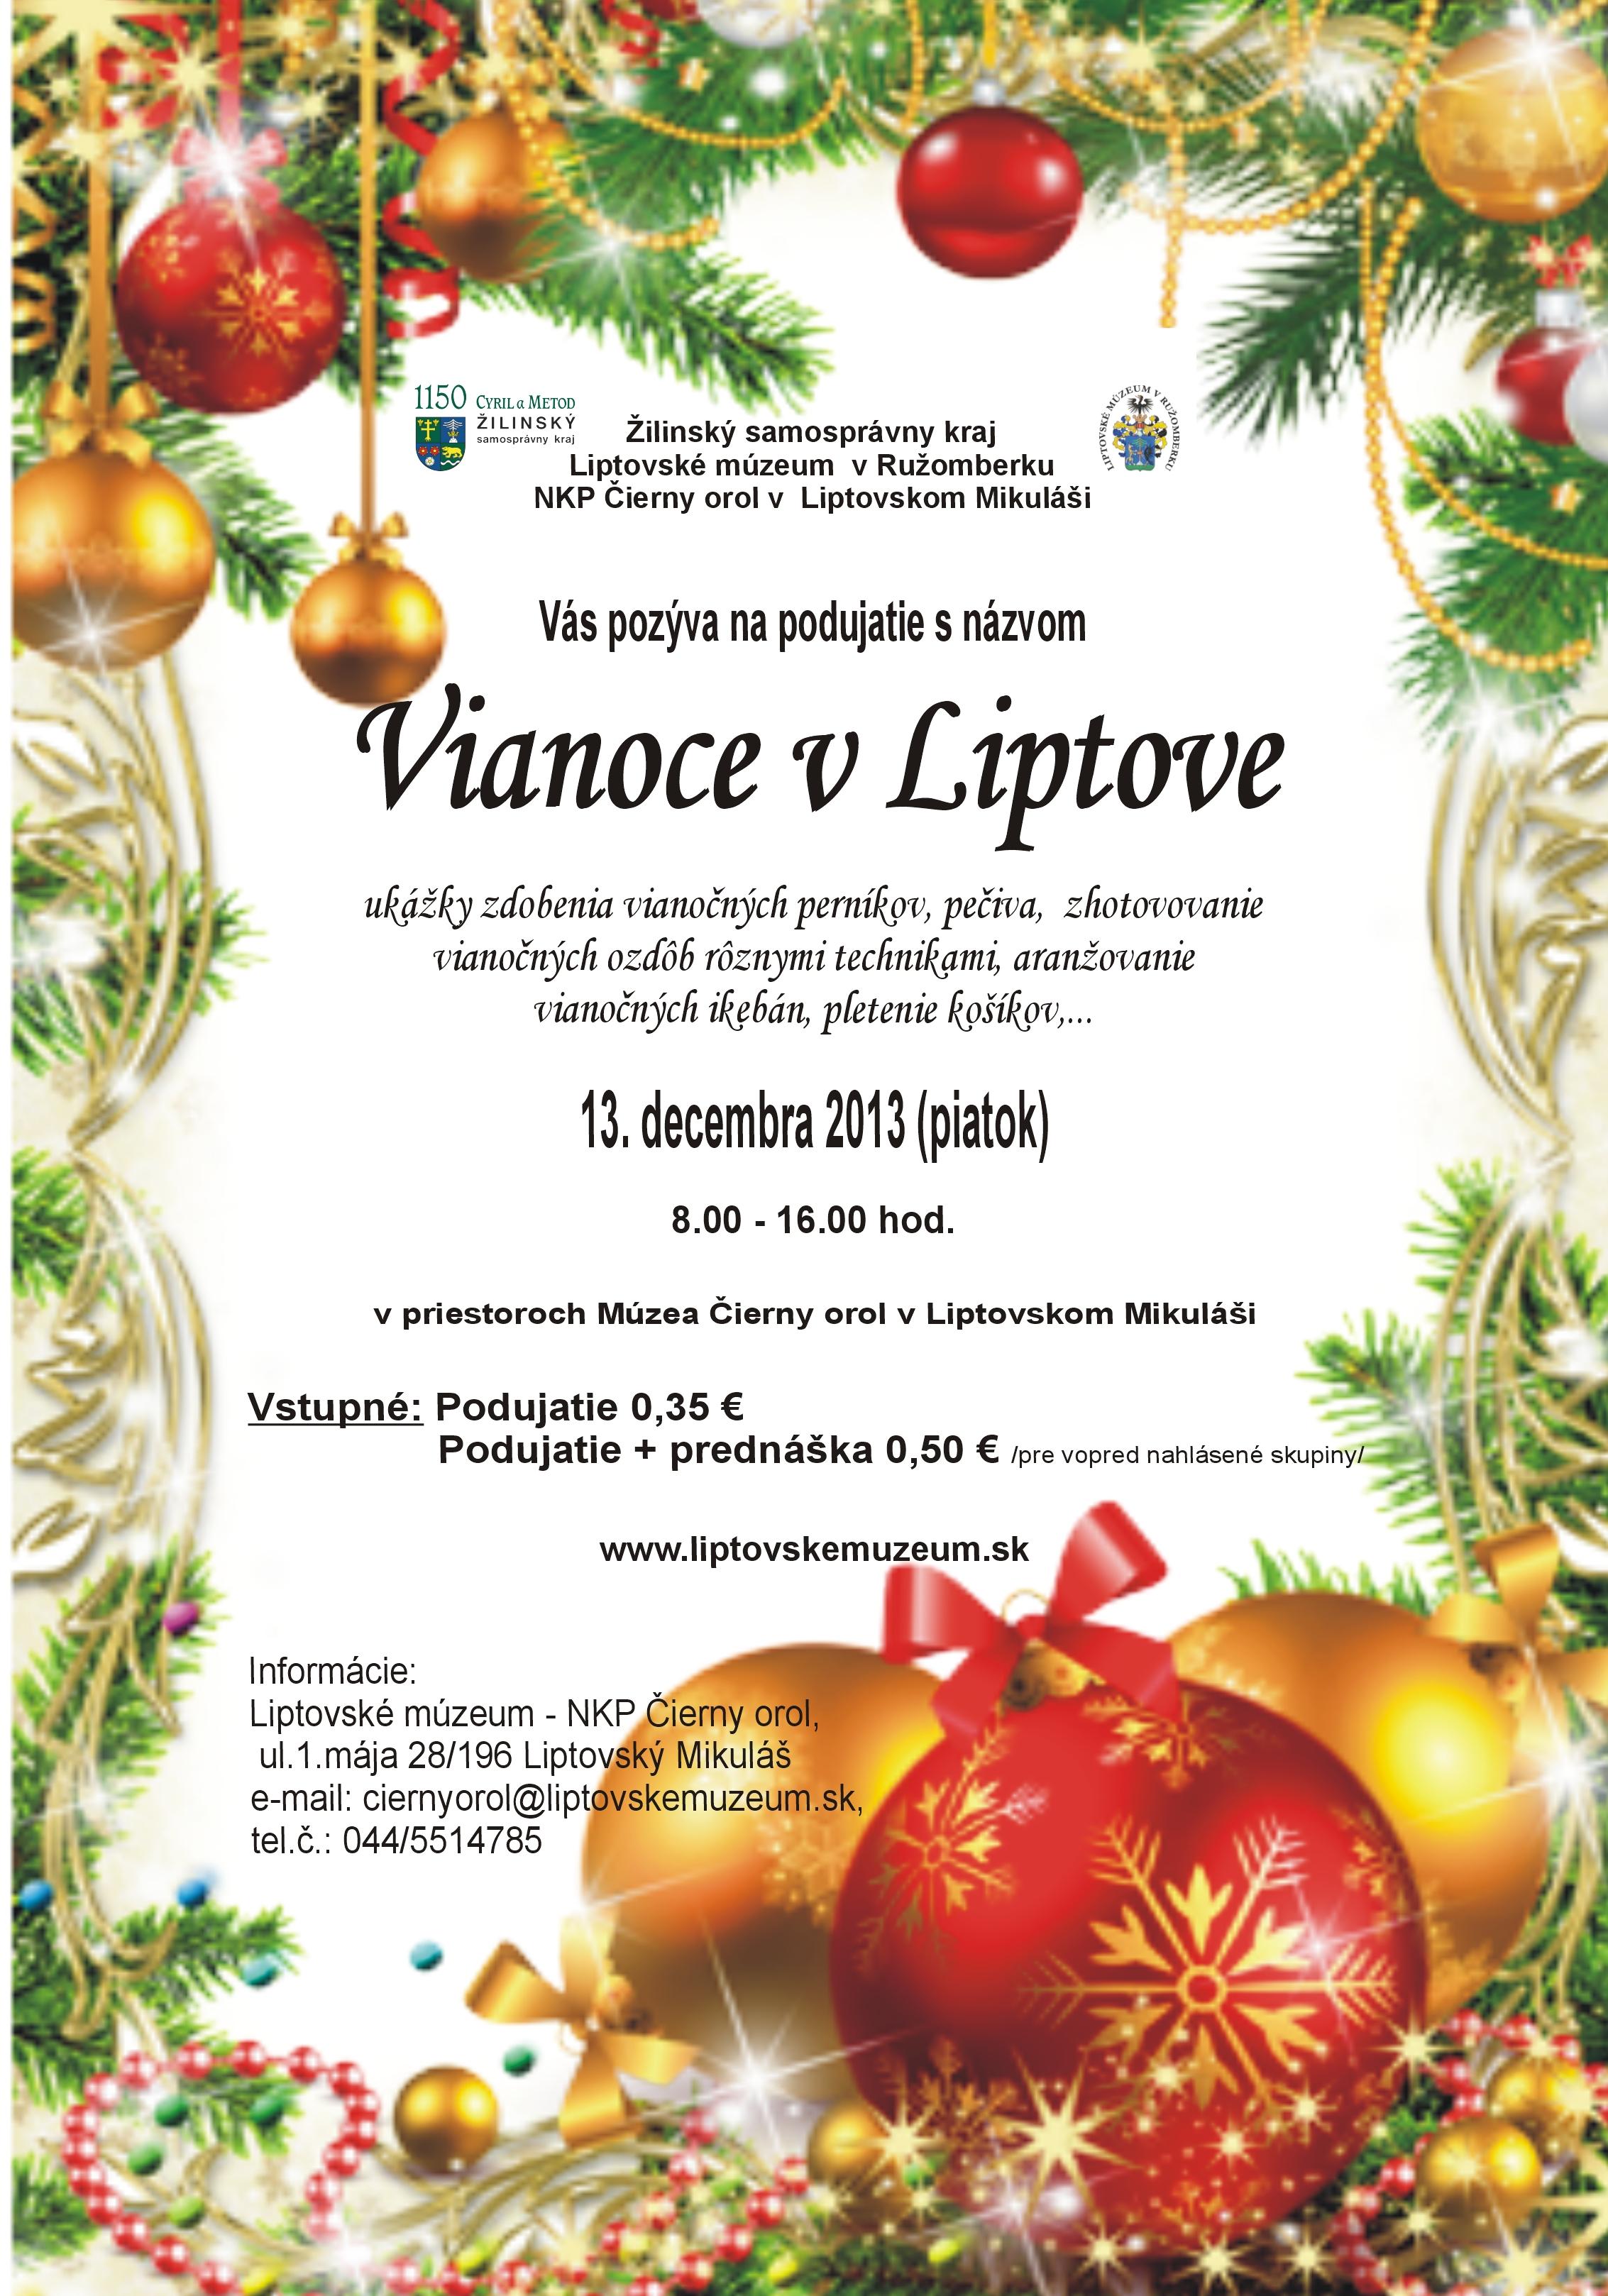 vianoce-v-liptove-co-lm-2013